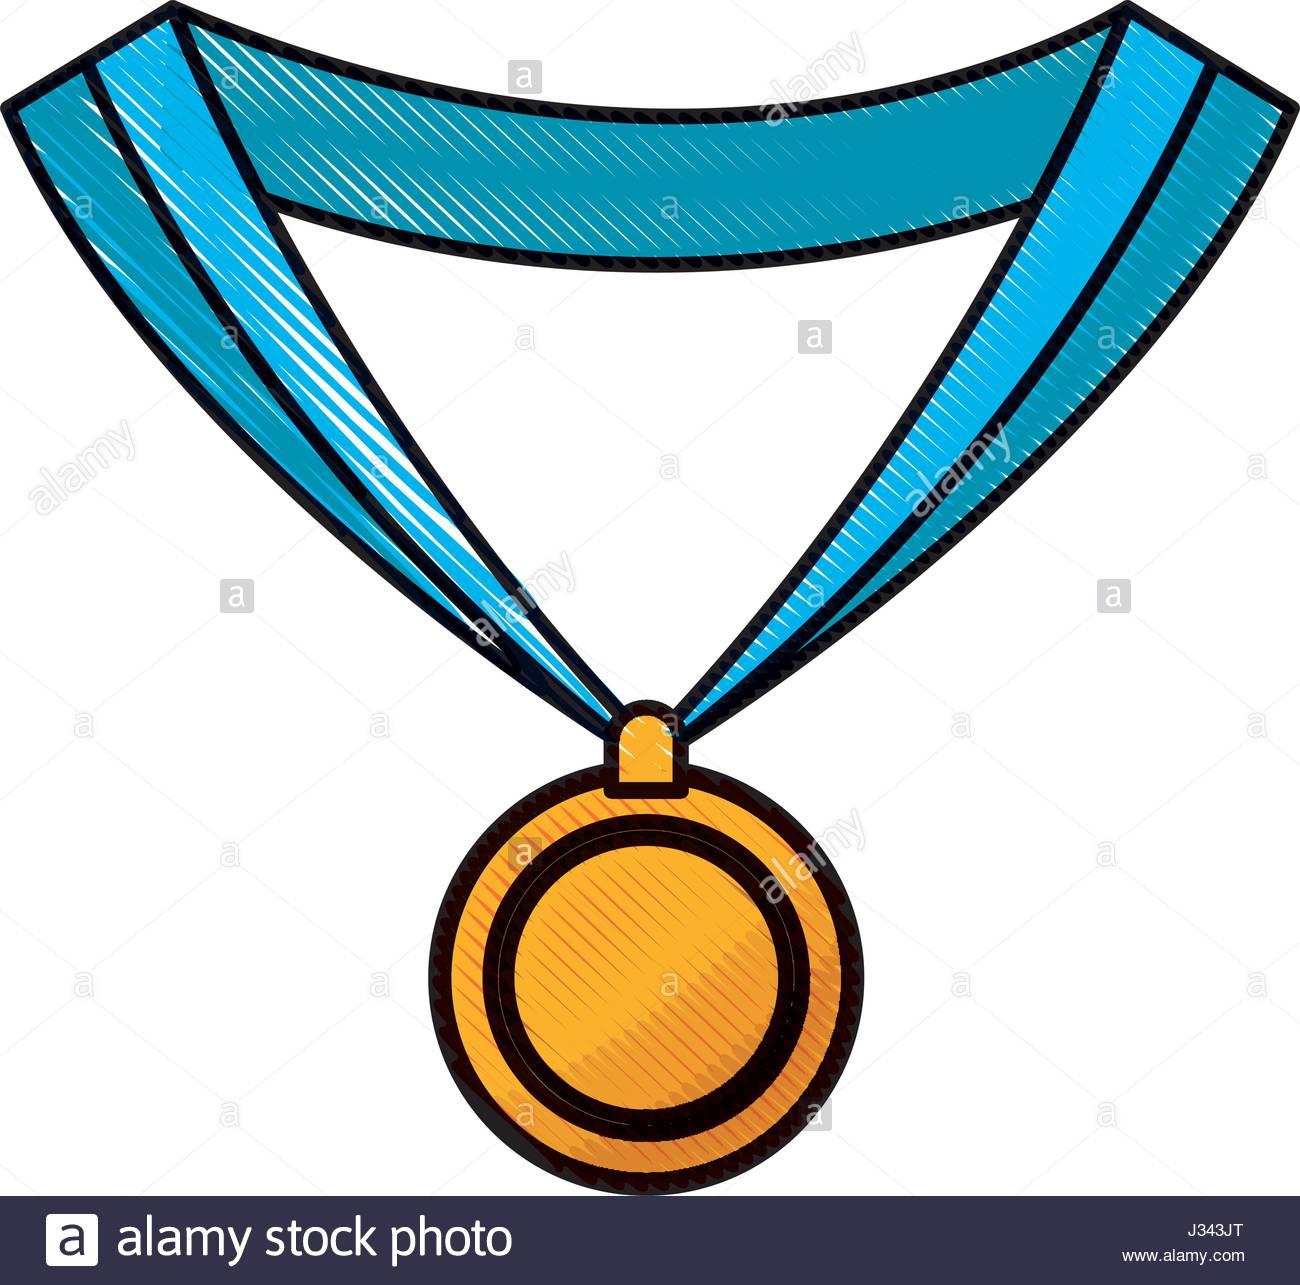 1300x1285 Drawing Medal Award Win Sport Image Stock Vector Art